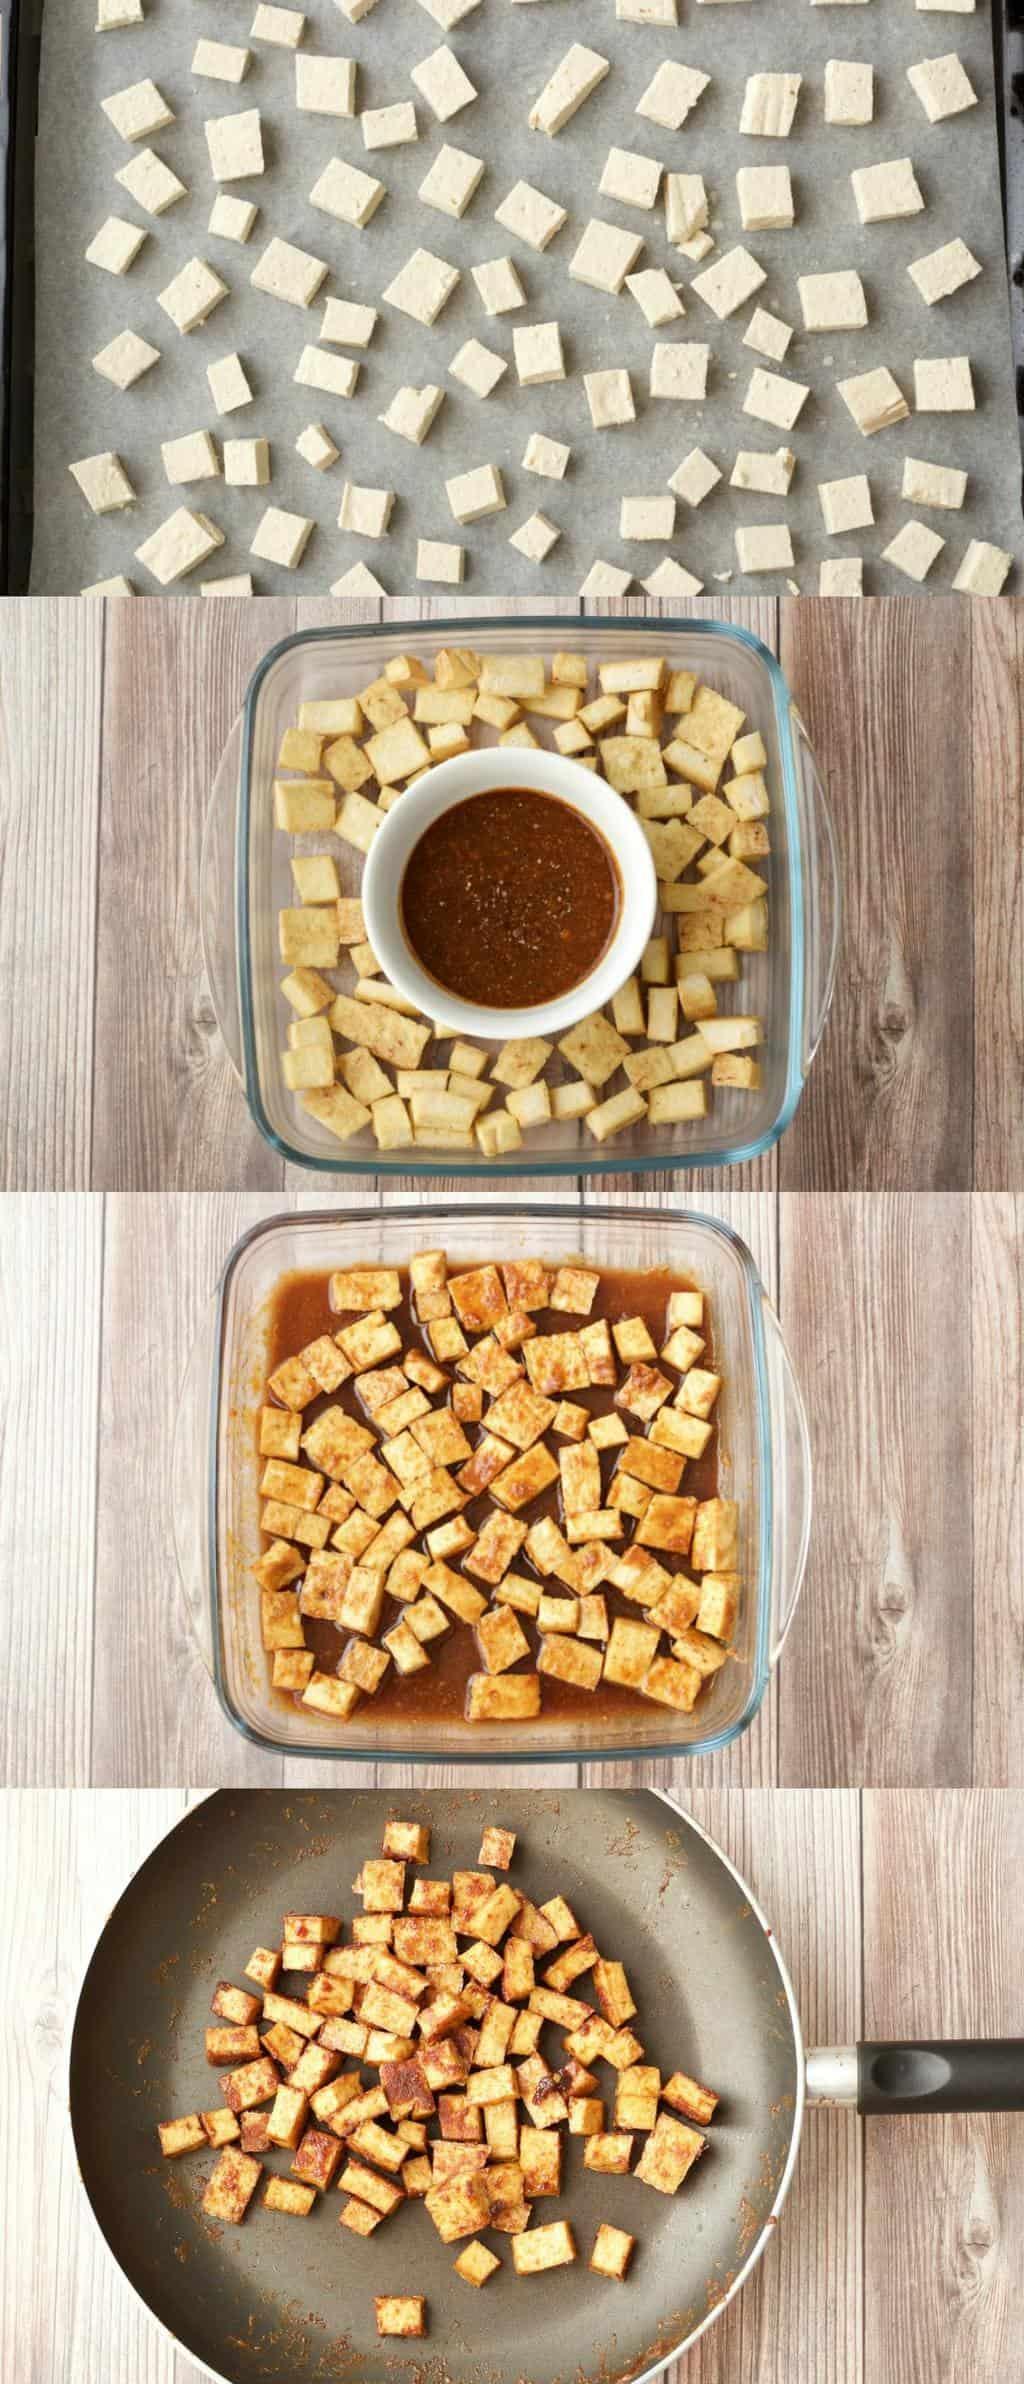 Making crispy baked tofu for our Green Curry Fried Rice #vegan #lovingitvegan